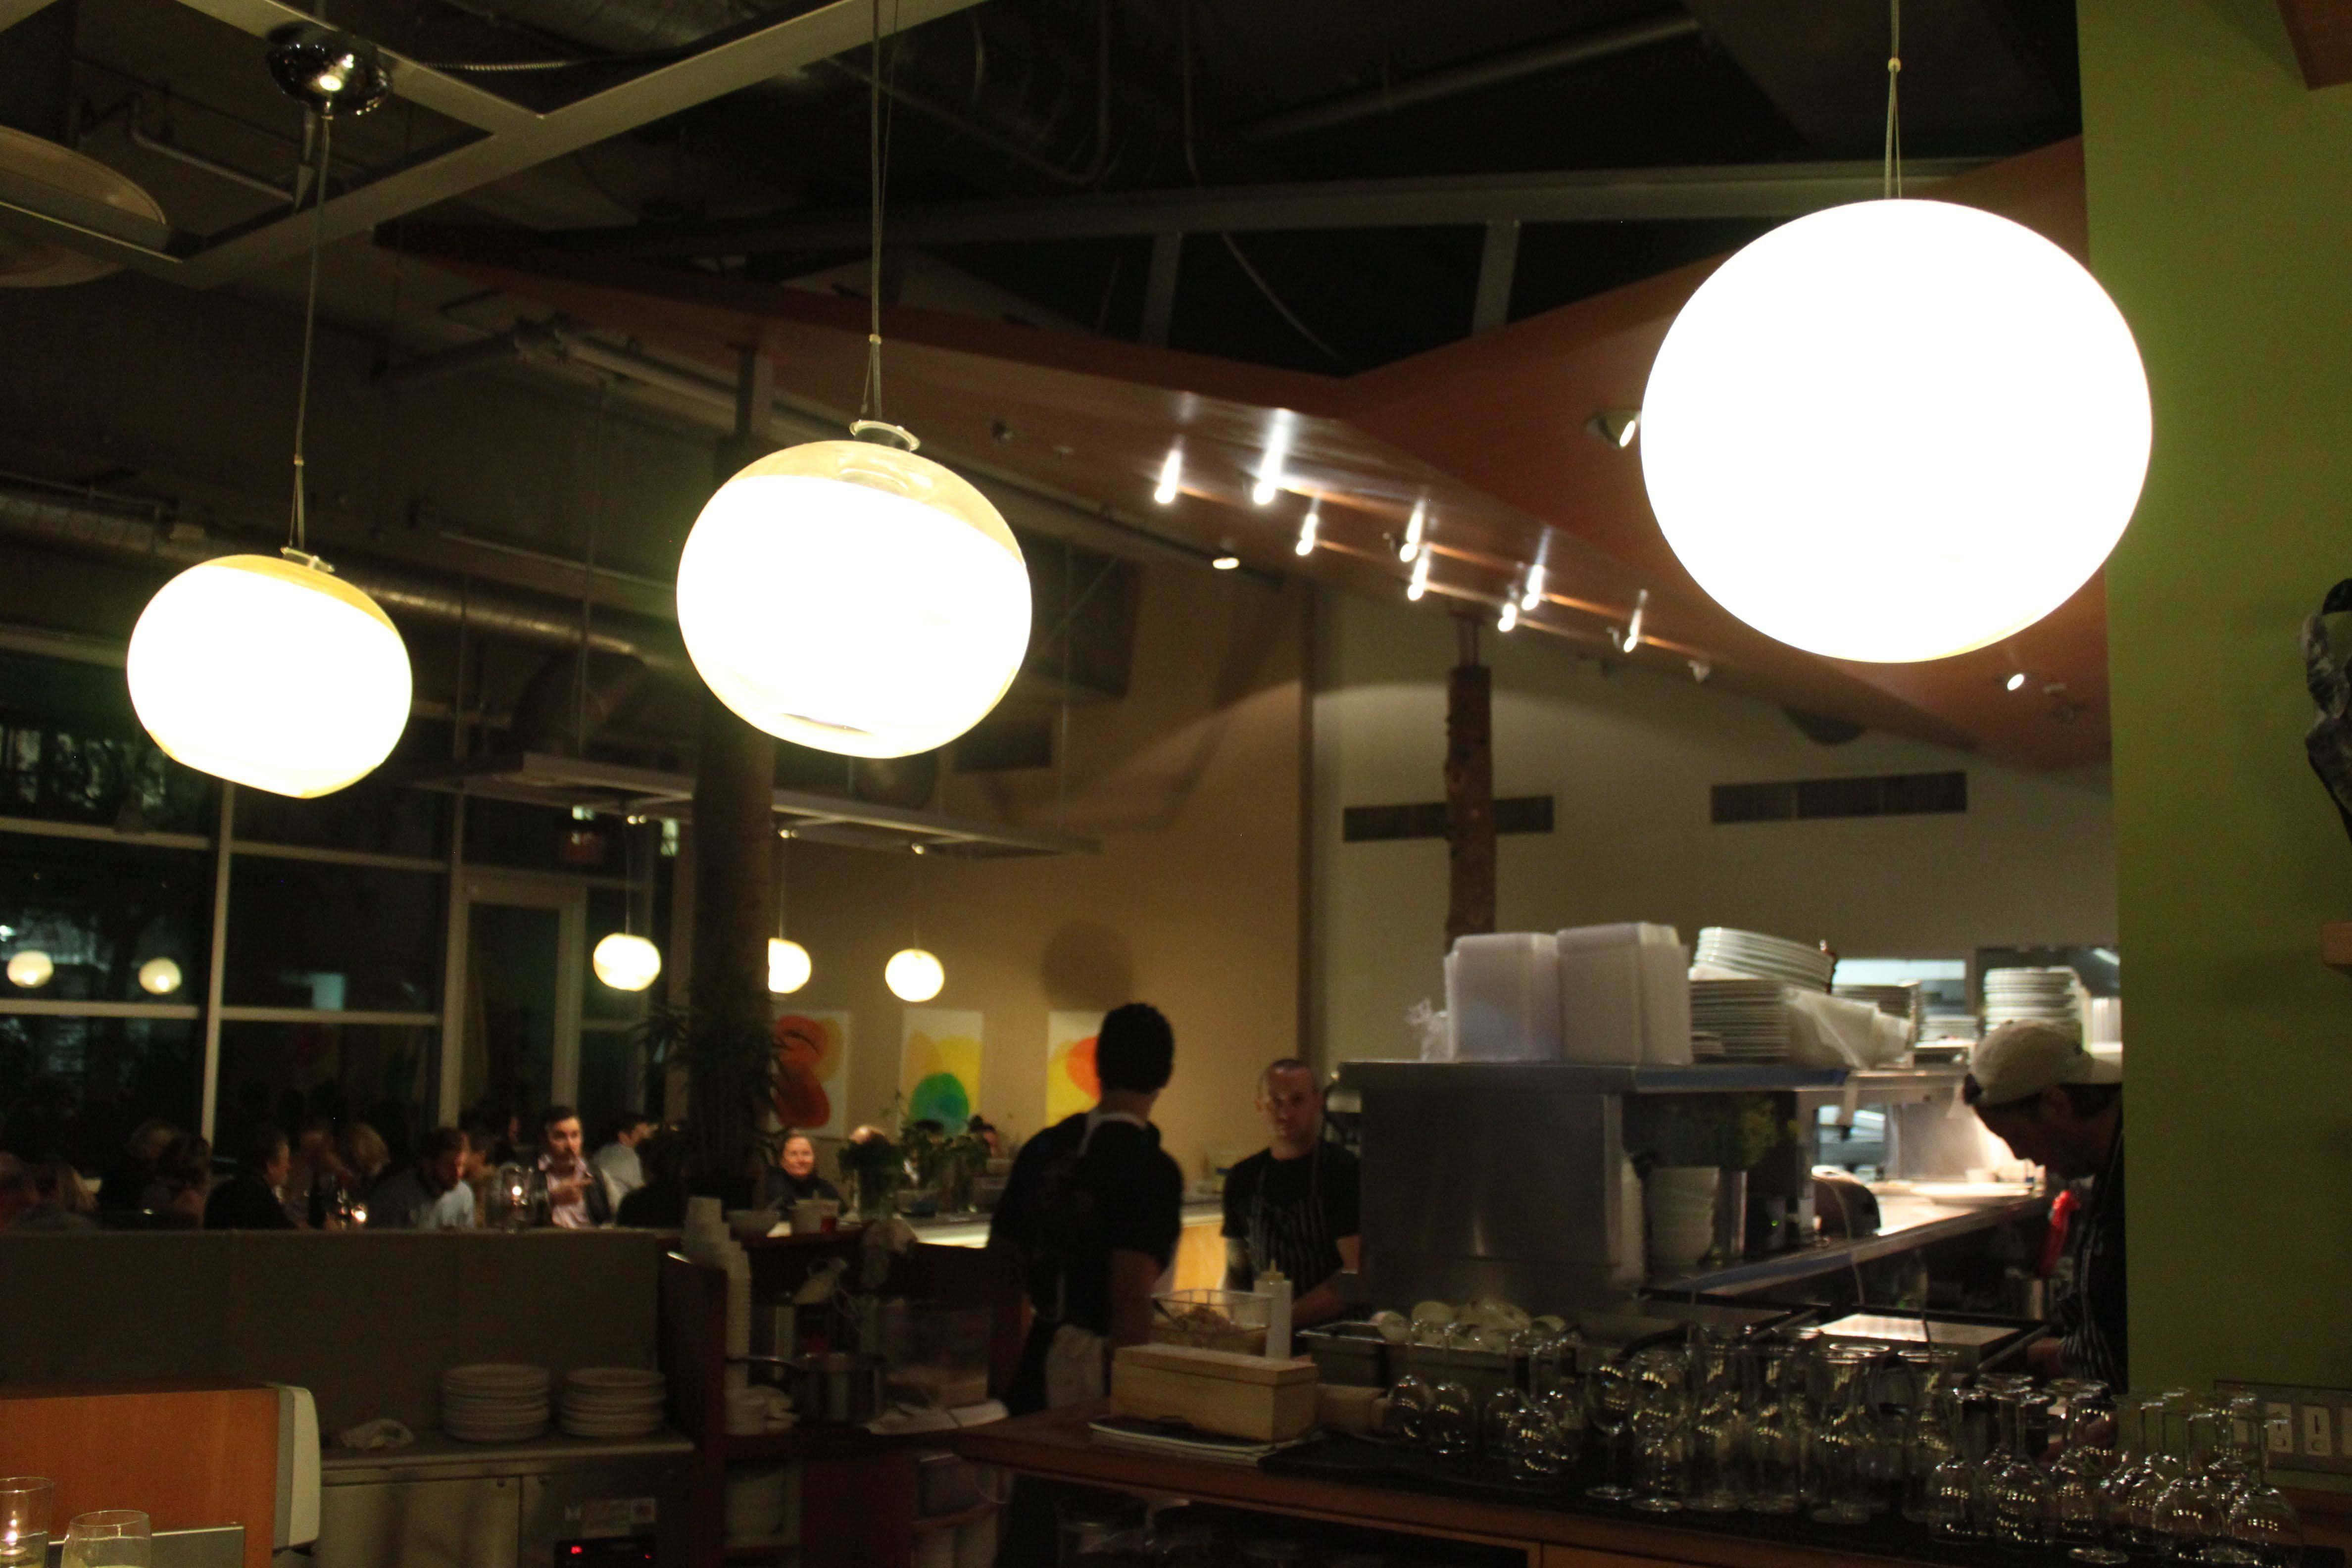 Ceiling Lights : Beautiful Commercial Lighting Fixtures Home Depot inside Restaurant Lighting Fixtures (Image 2 of 15)